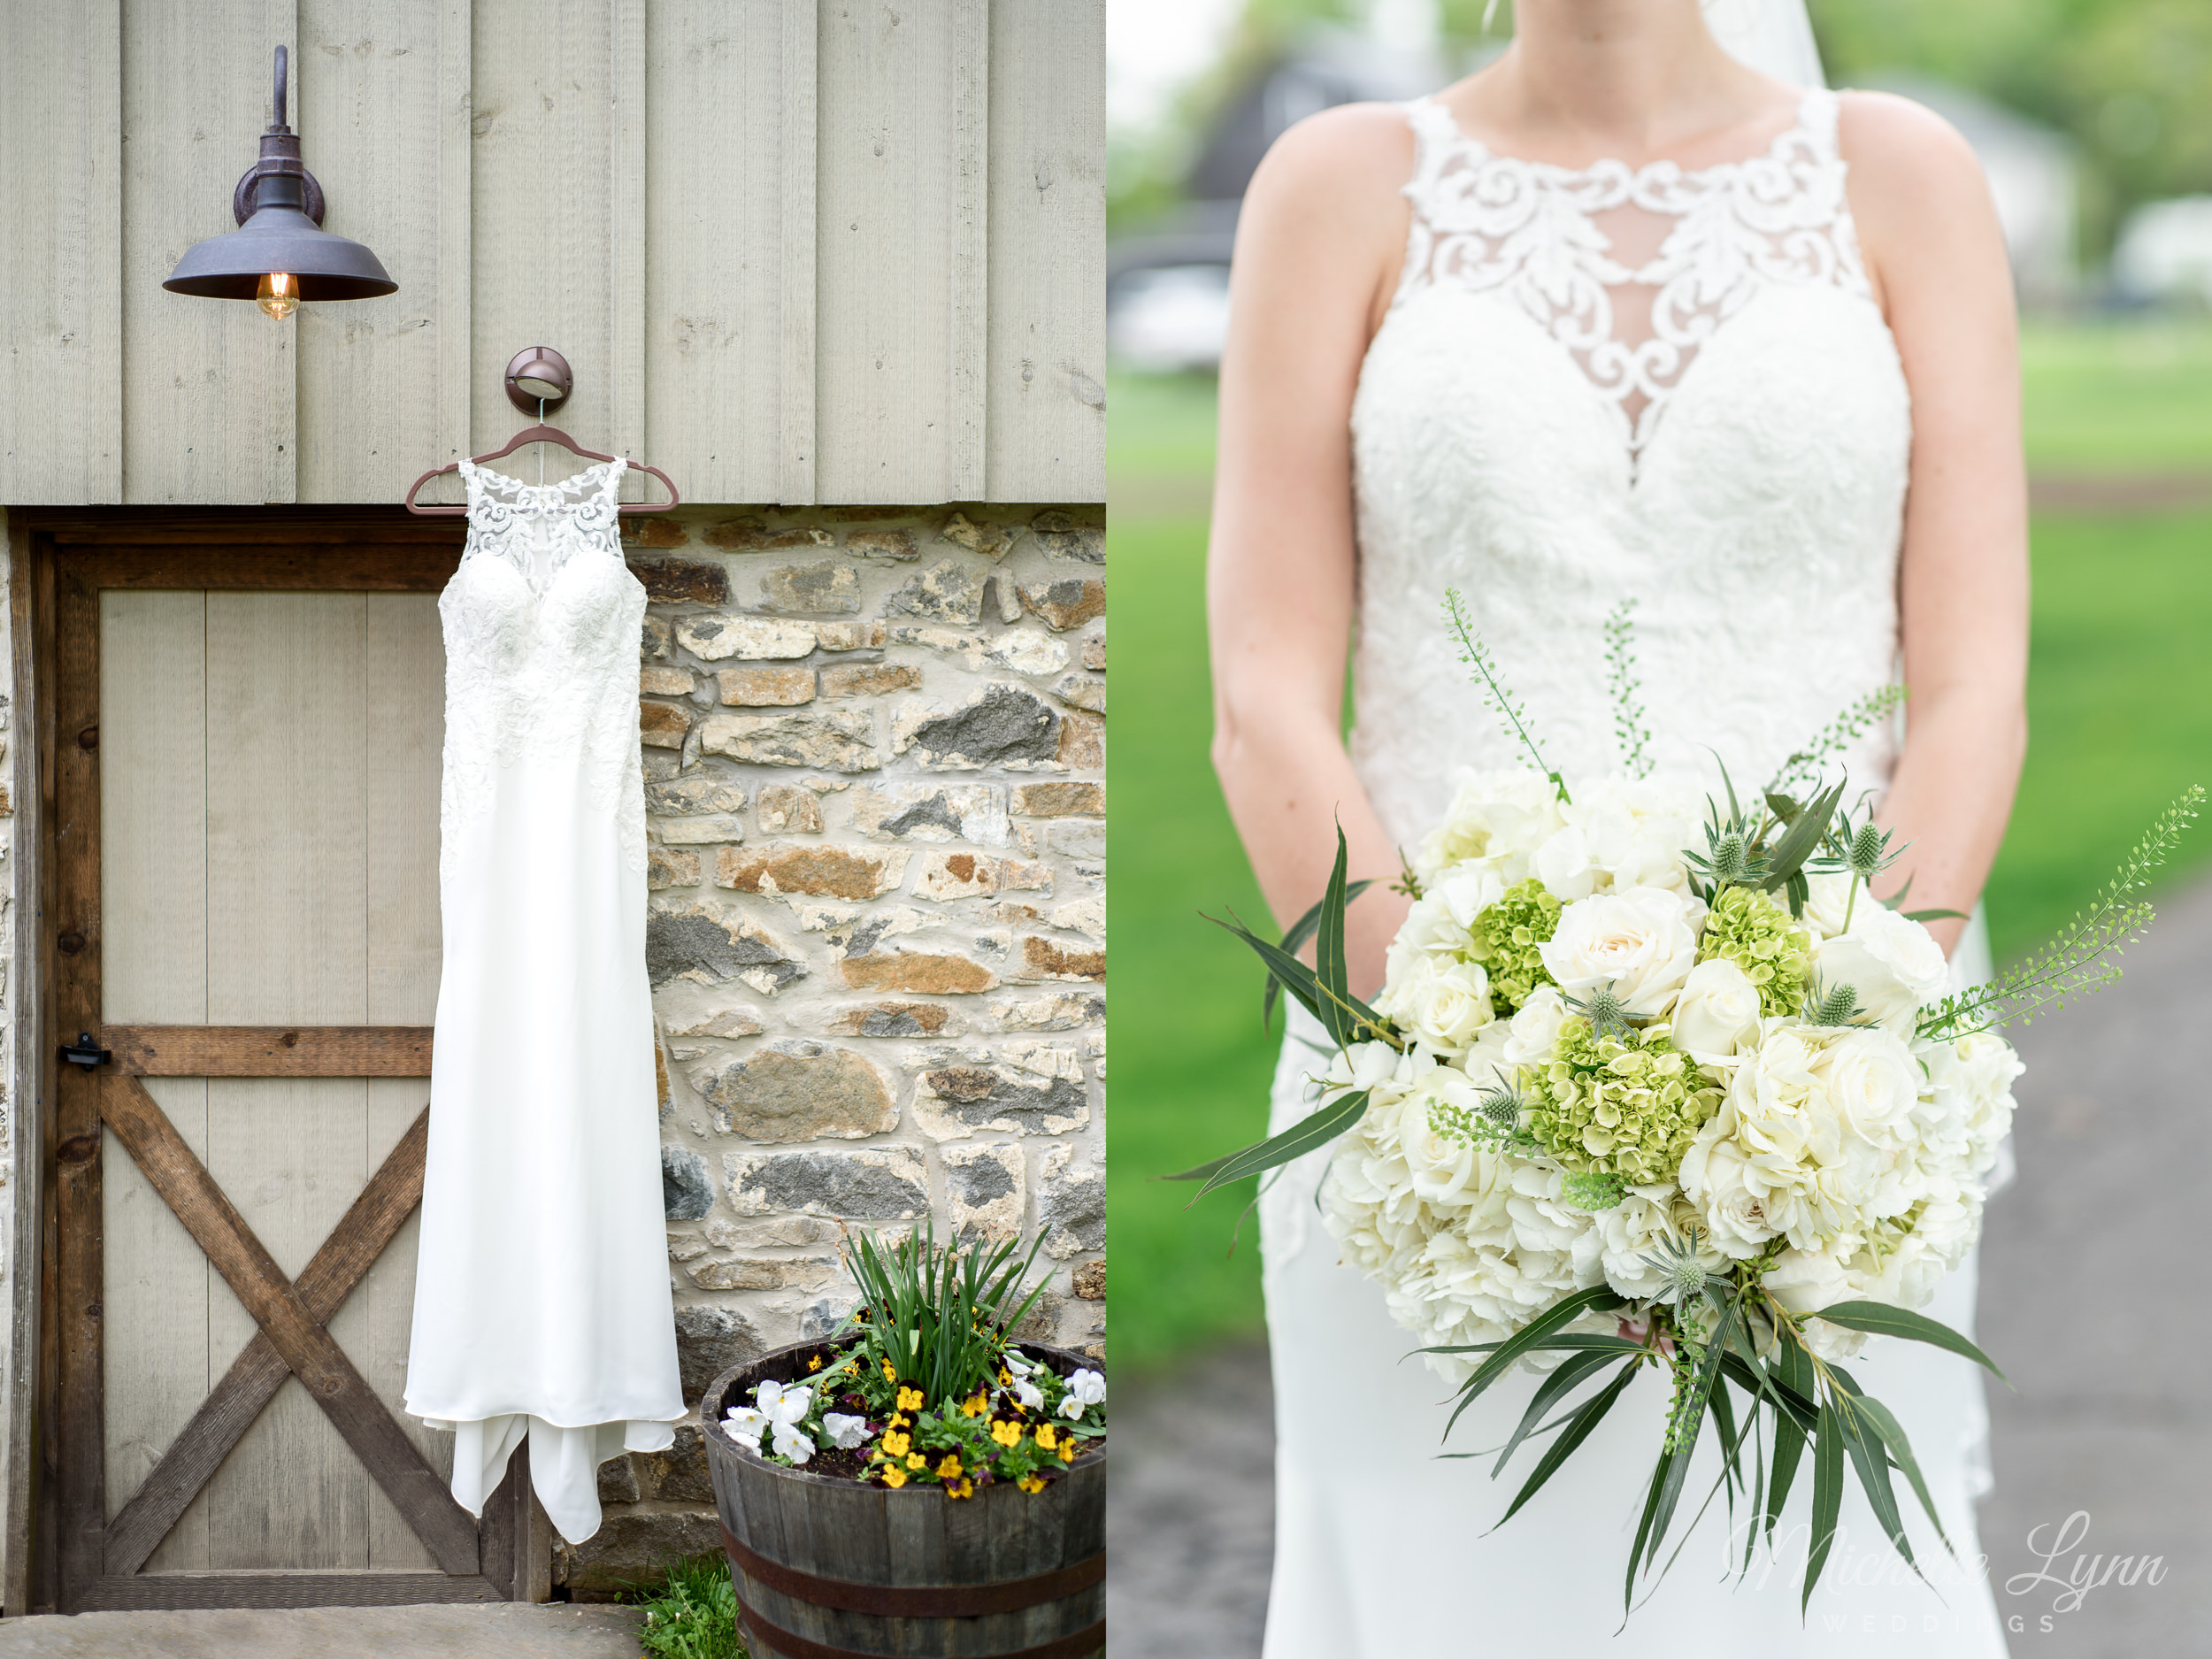 mlw-the-farm-bakery-and-events-wedding-photos-4.jpg